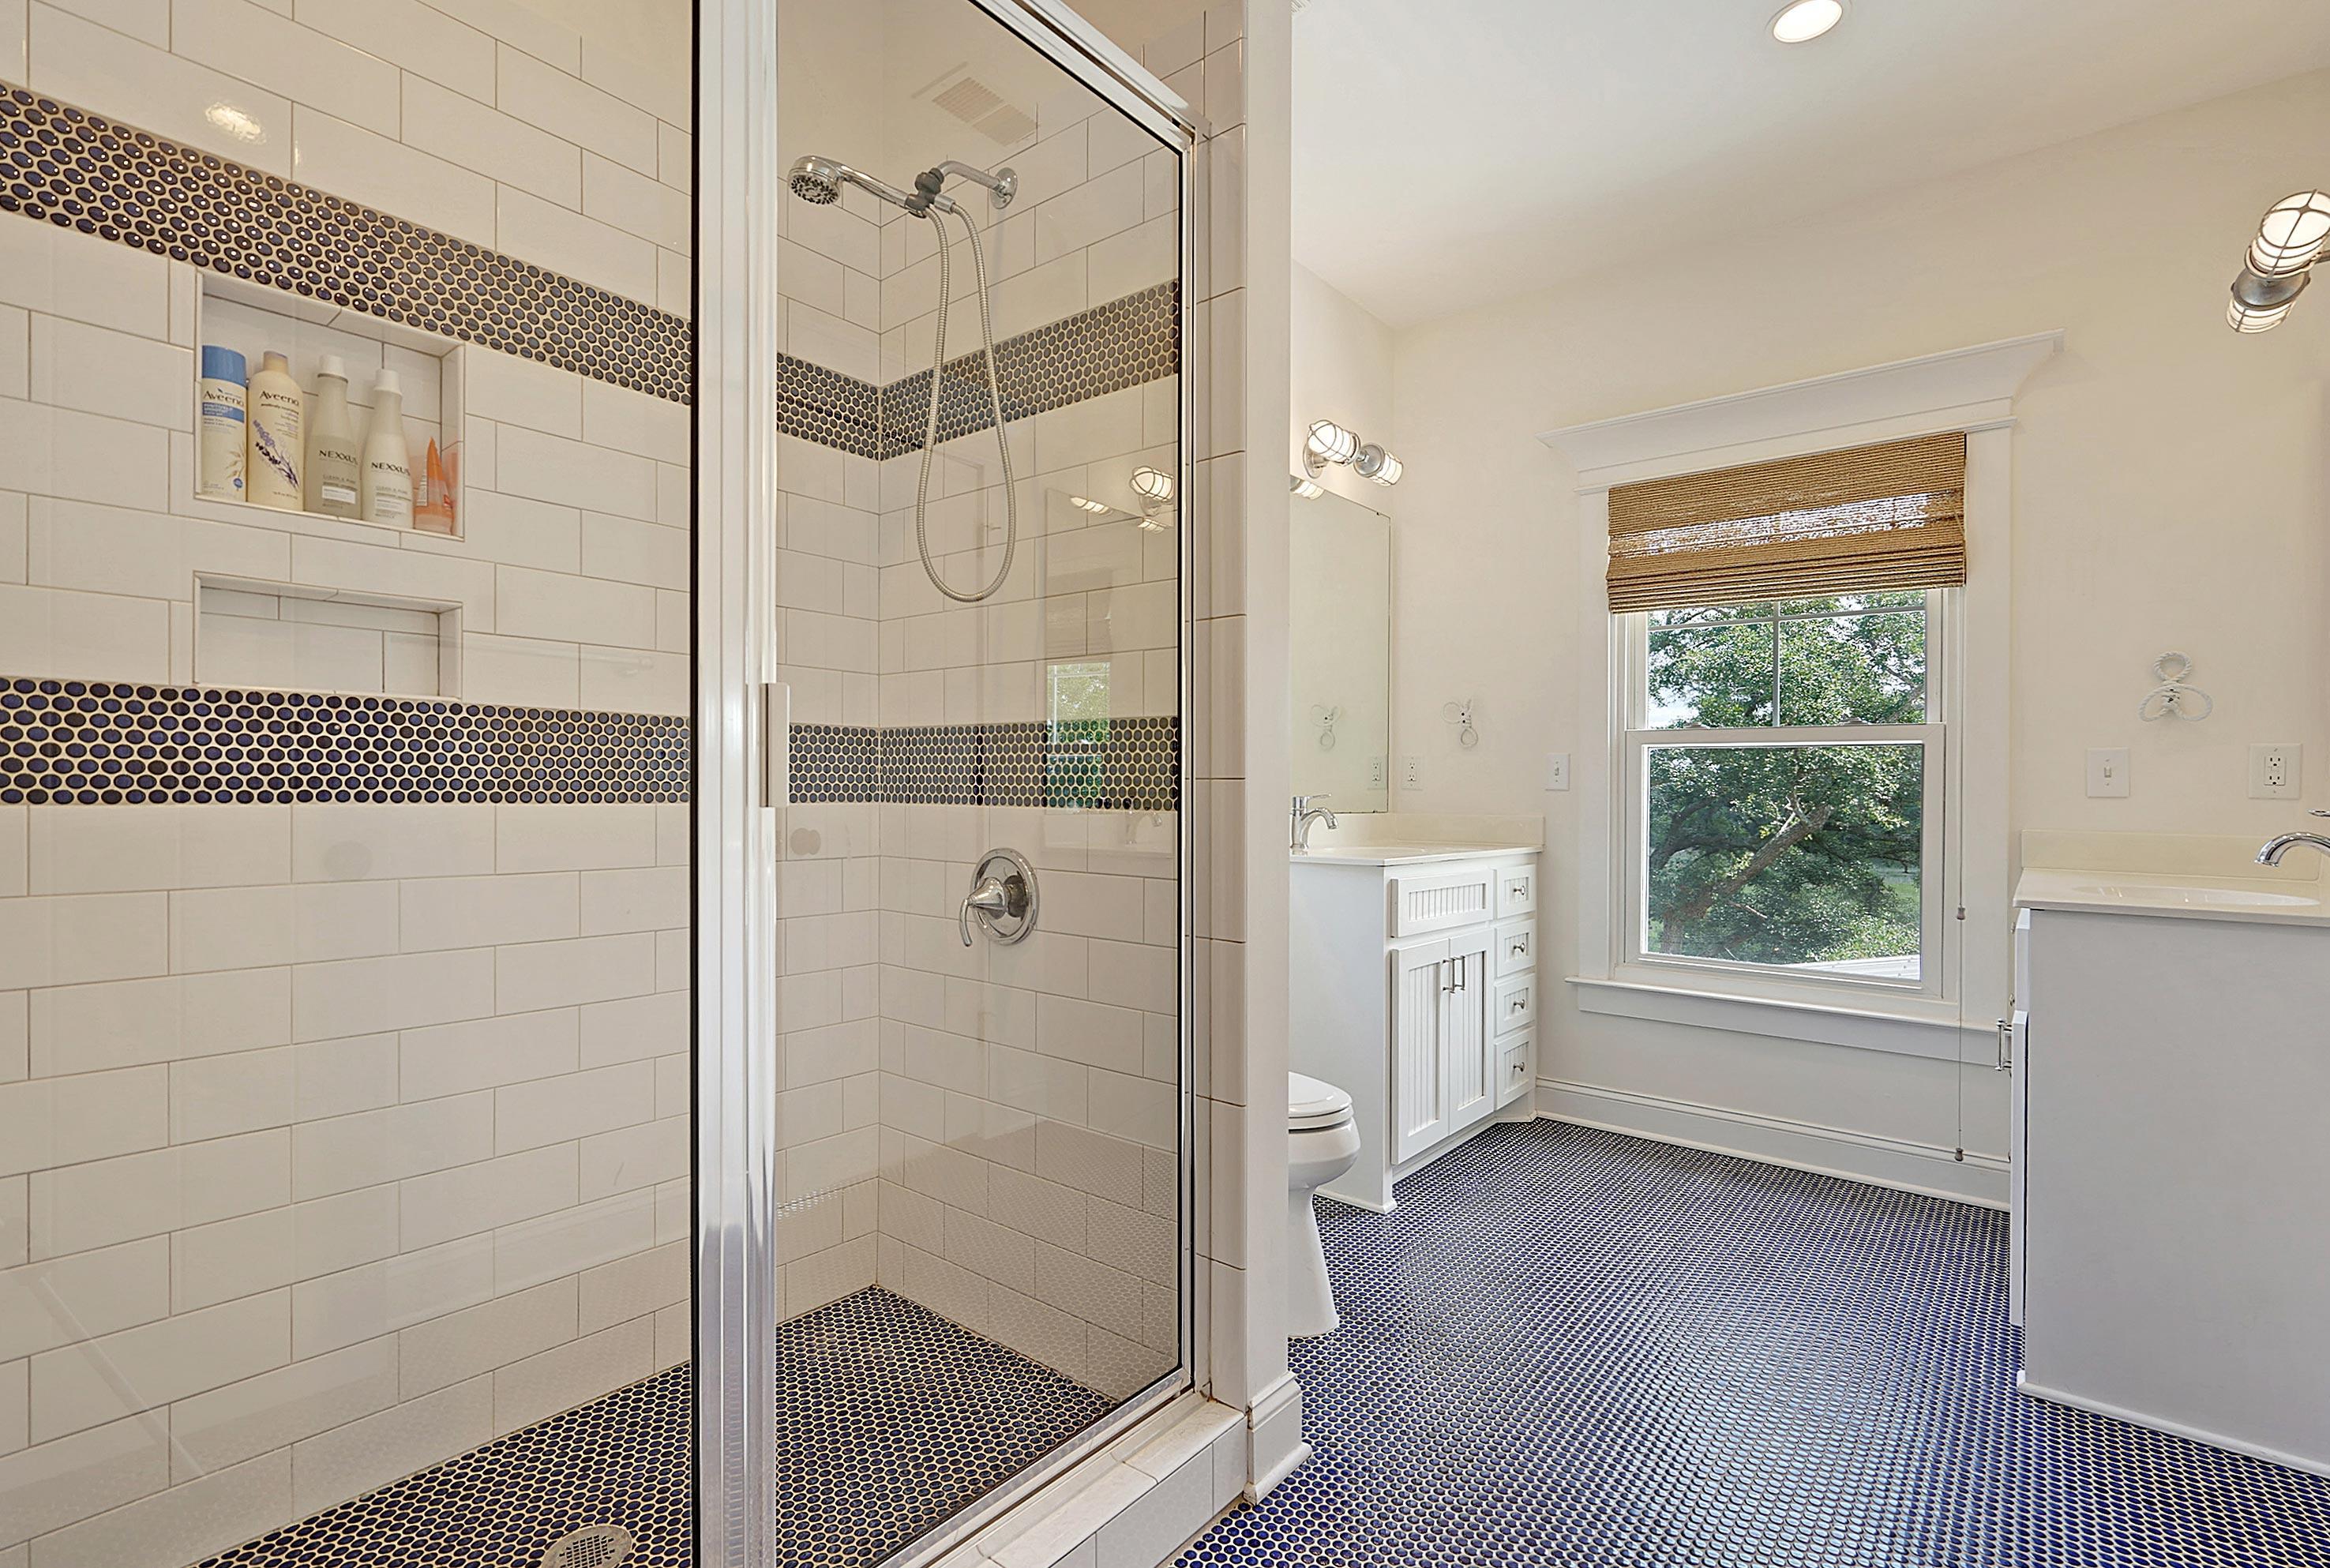 Grassy Creek Homes For Sale - 294 River Oak, Mount Pleasant, SC - 18